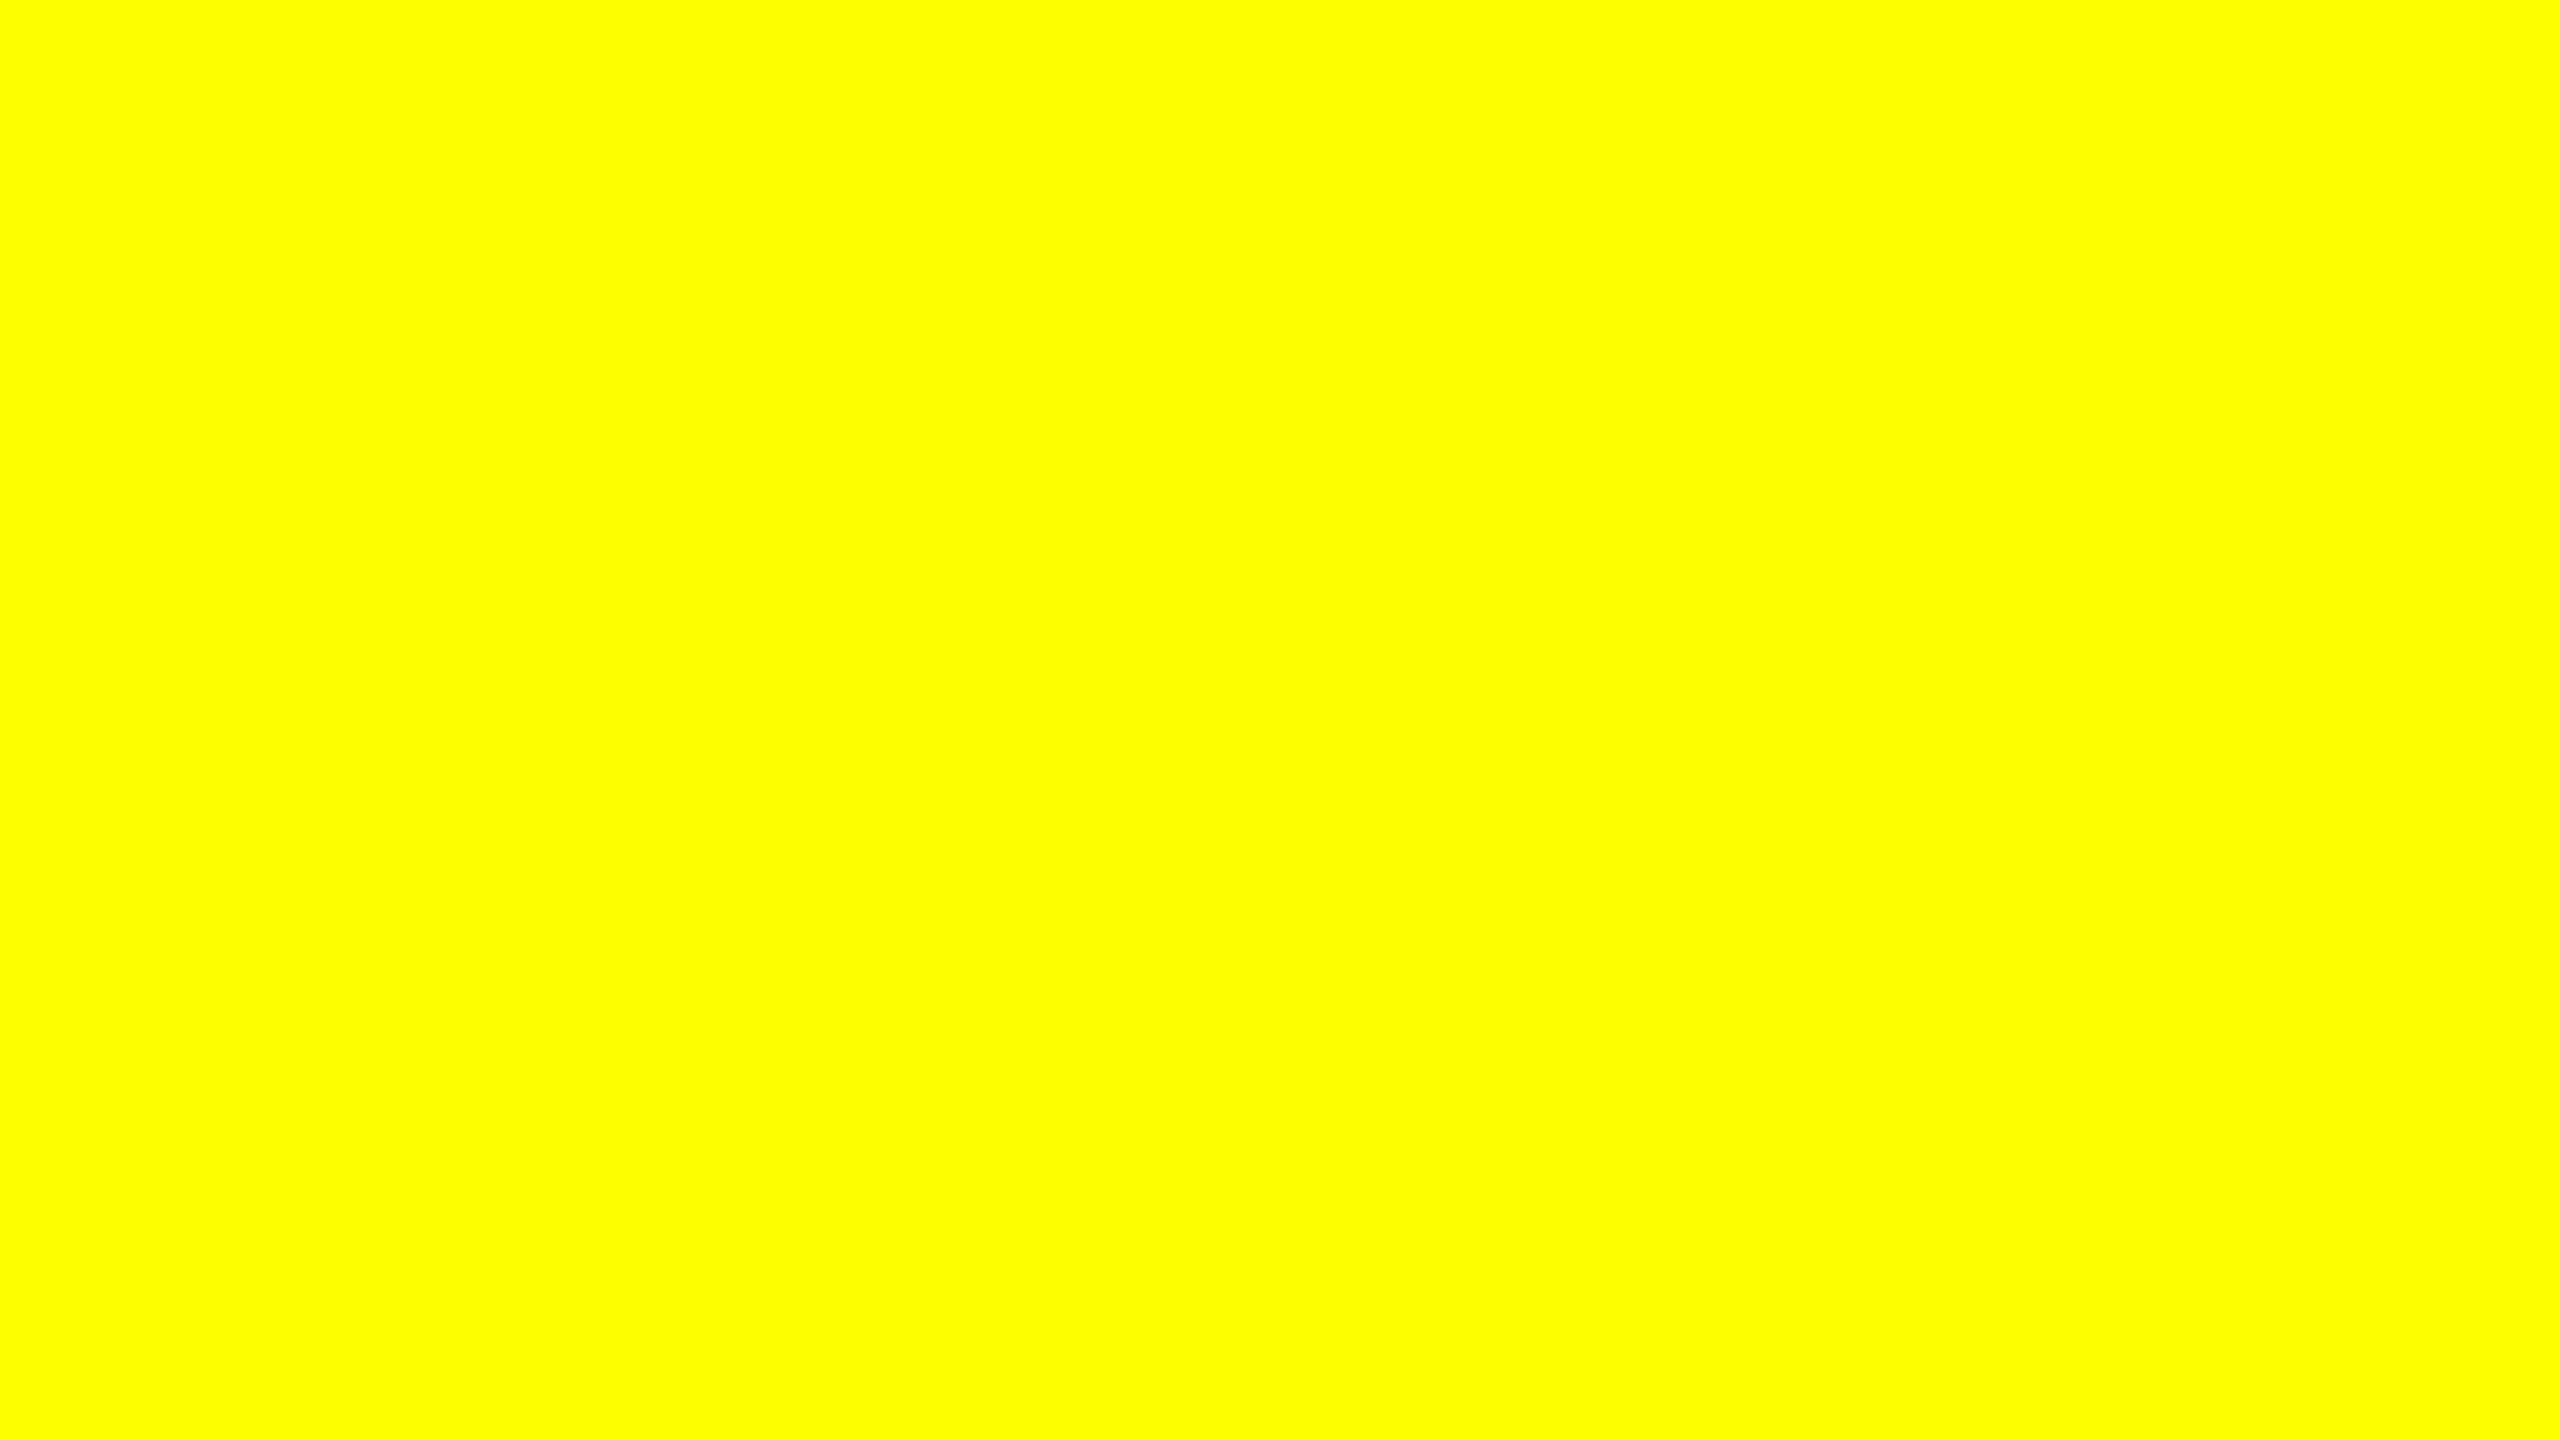 2560x1440 Lemon Glacier Solid Color Background